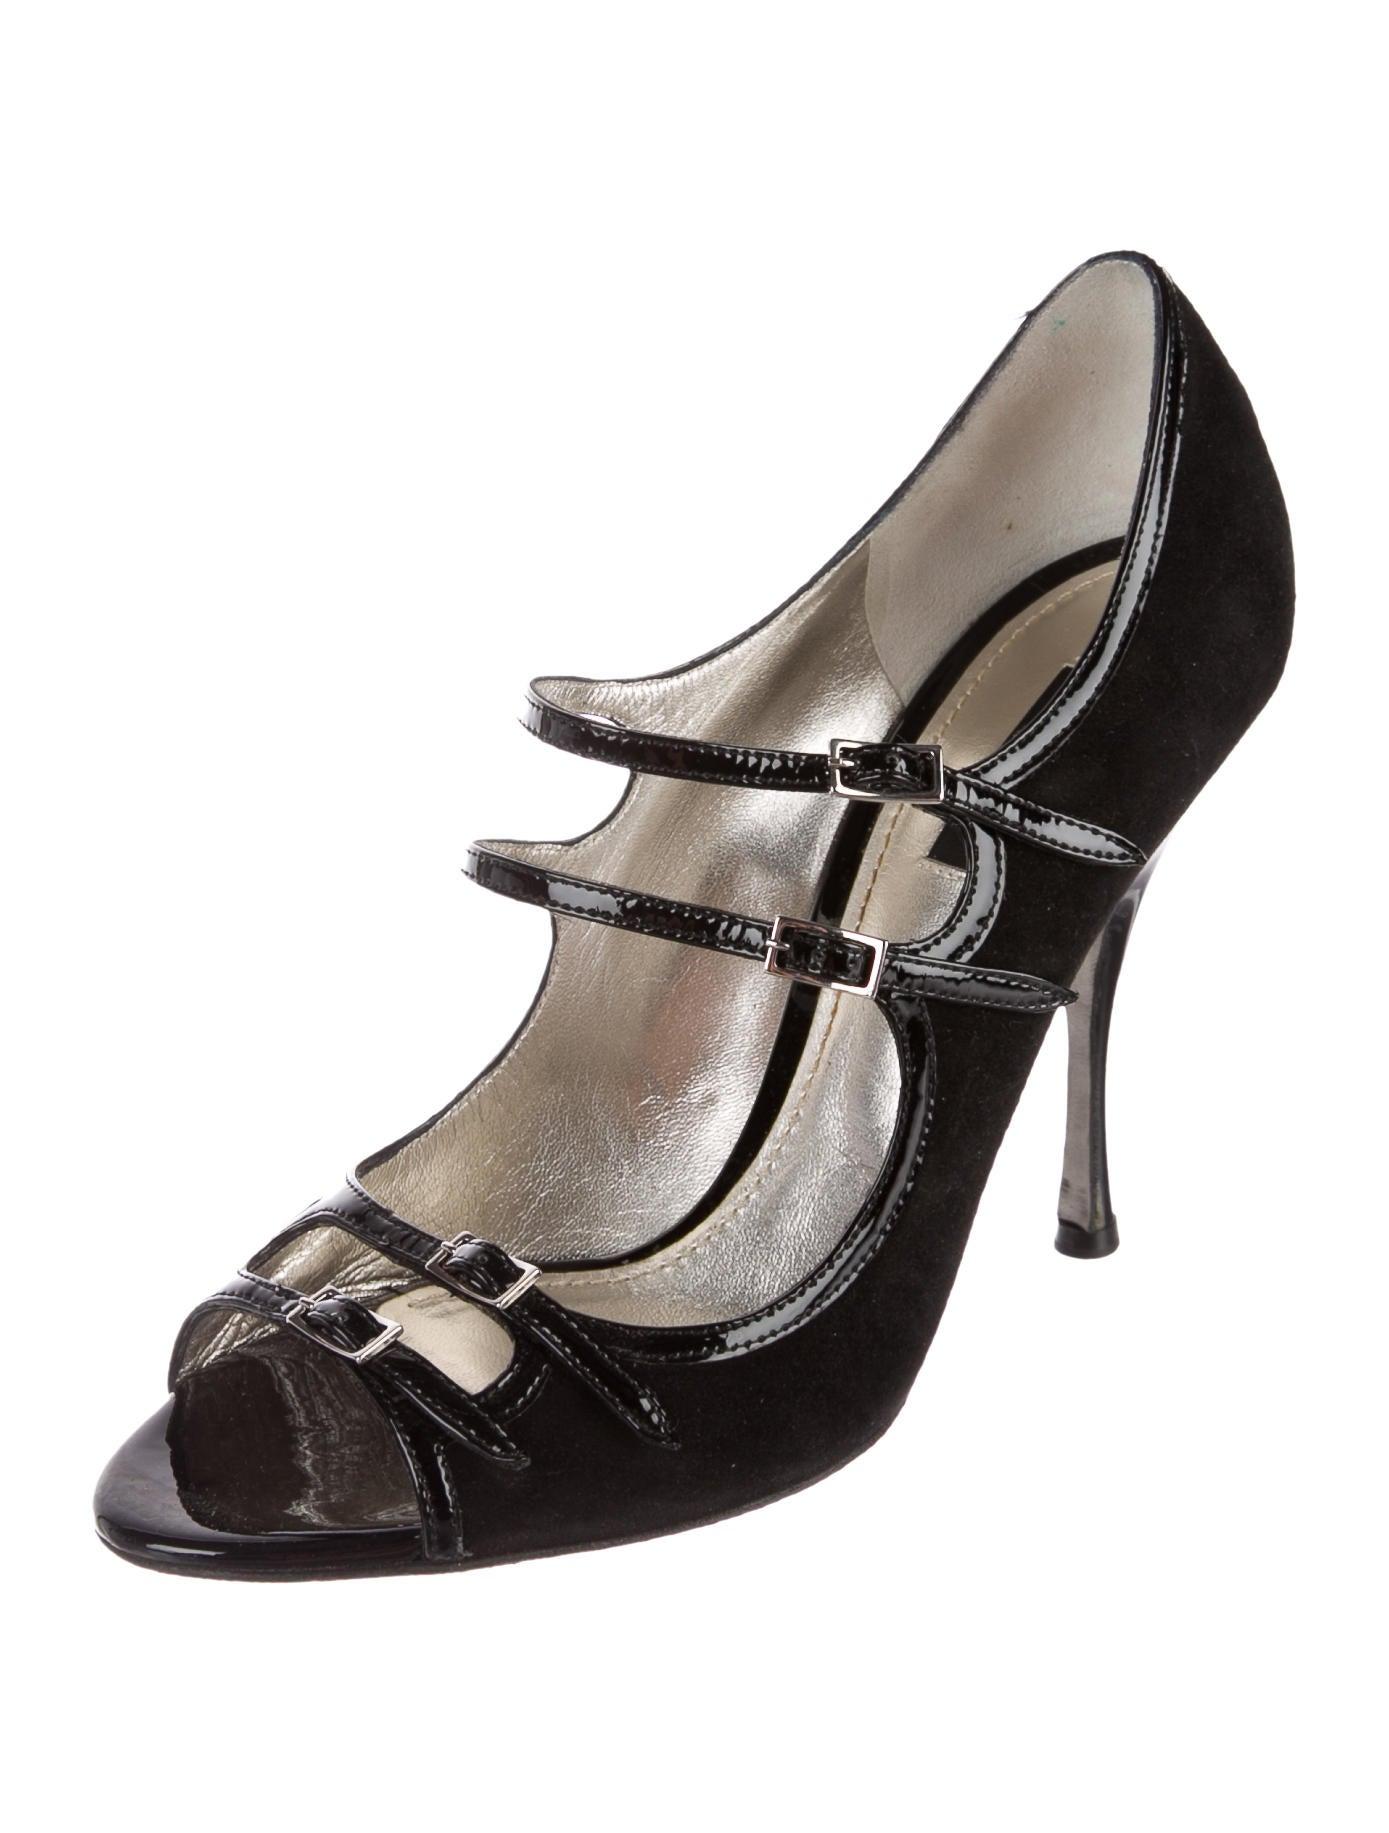 enjoy cheap price Dolce & Gabbana Multistrap Peep-Toe Pumps clearance get authentic cheap sale tumblr jQGAKP113I